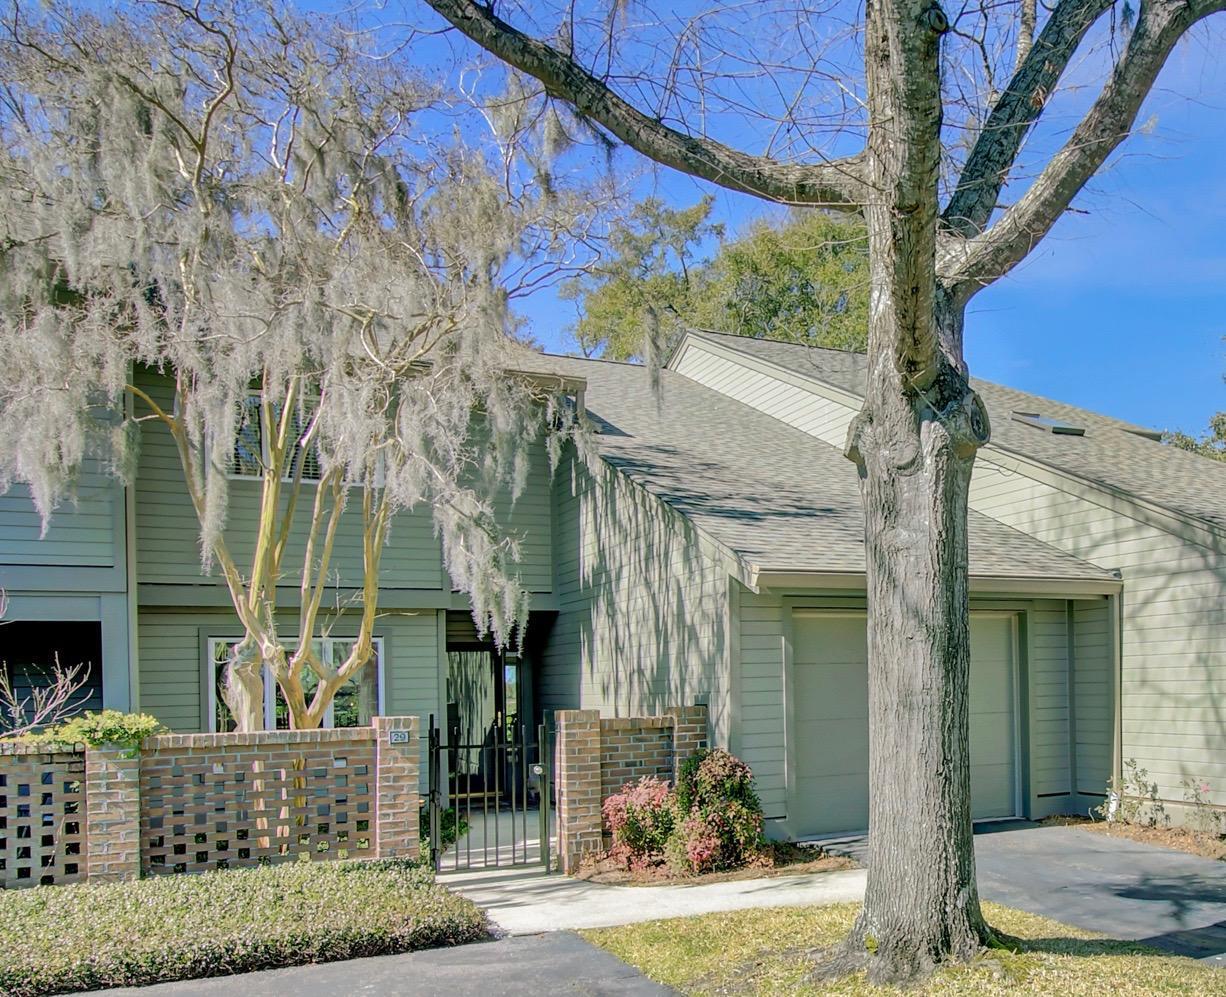 Wappoo Creek Place Homes For Sale - 29 Wappoo Creek, Charleston, SC - 34